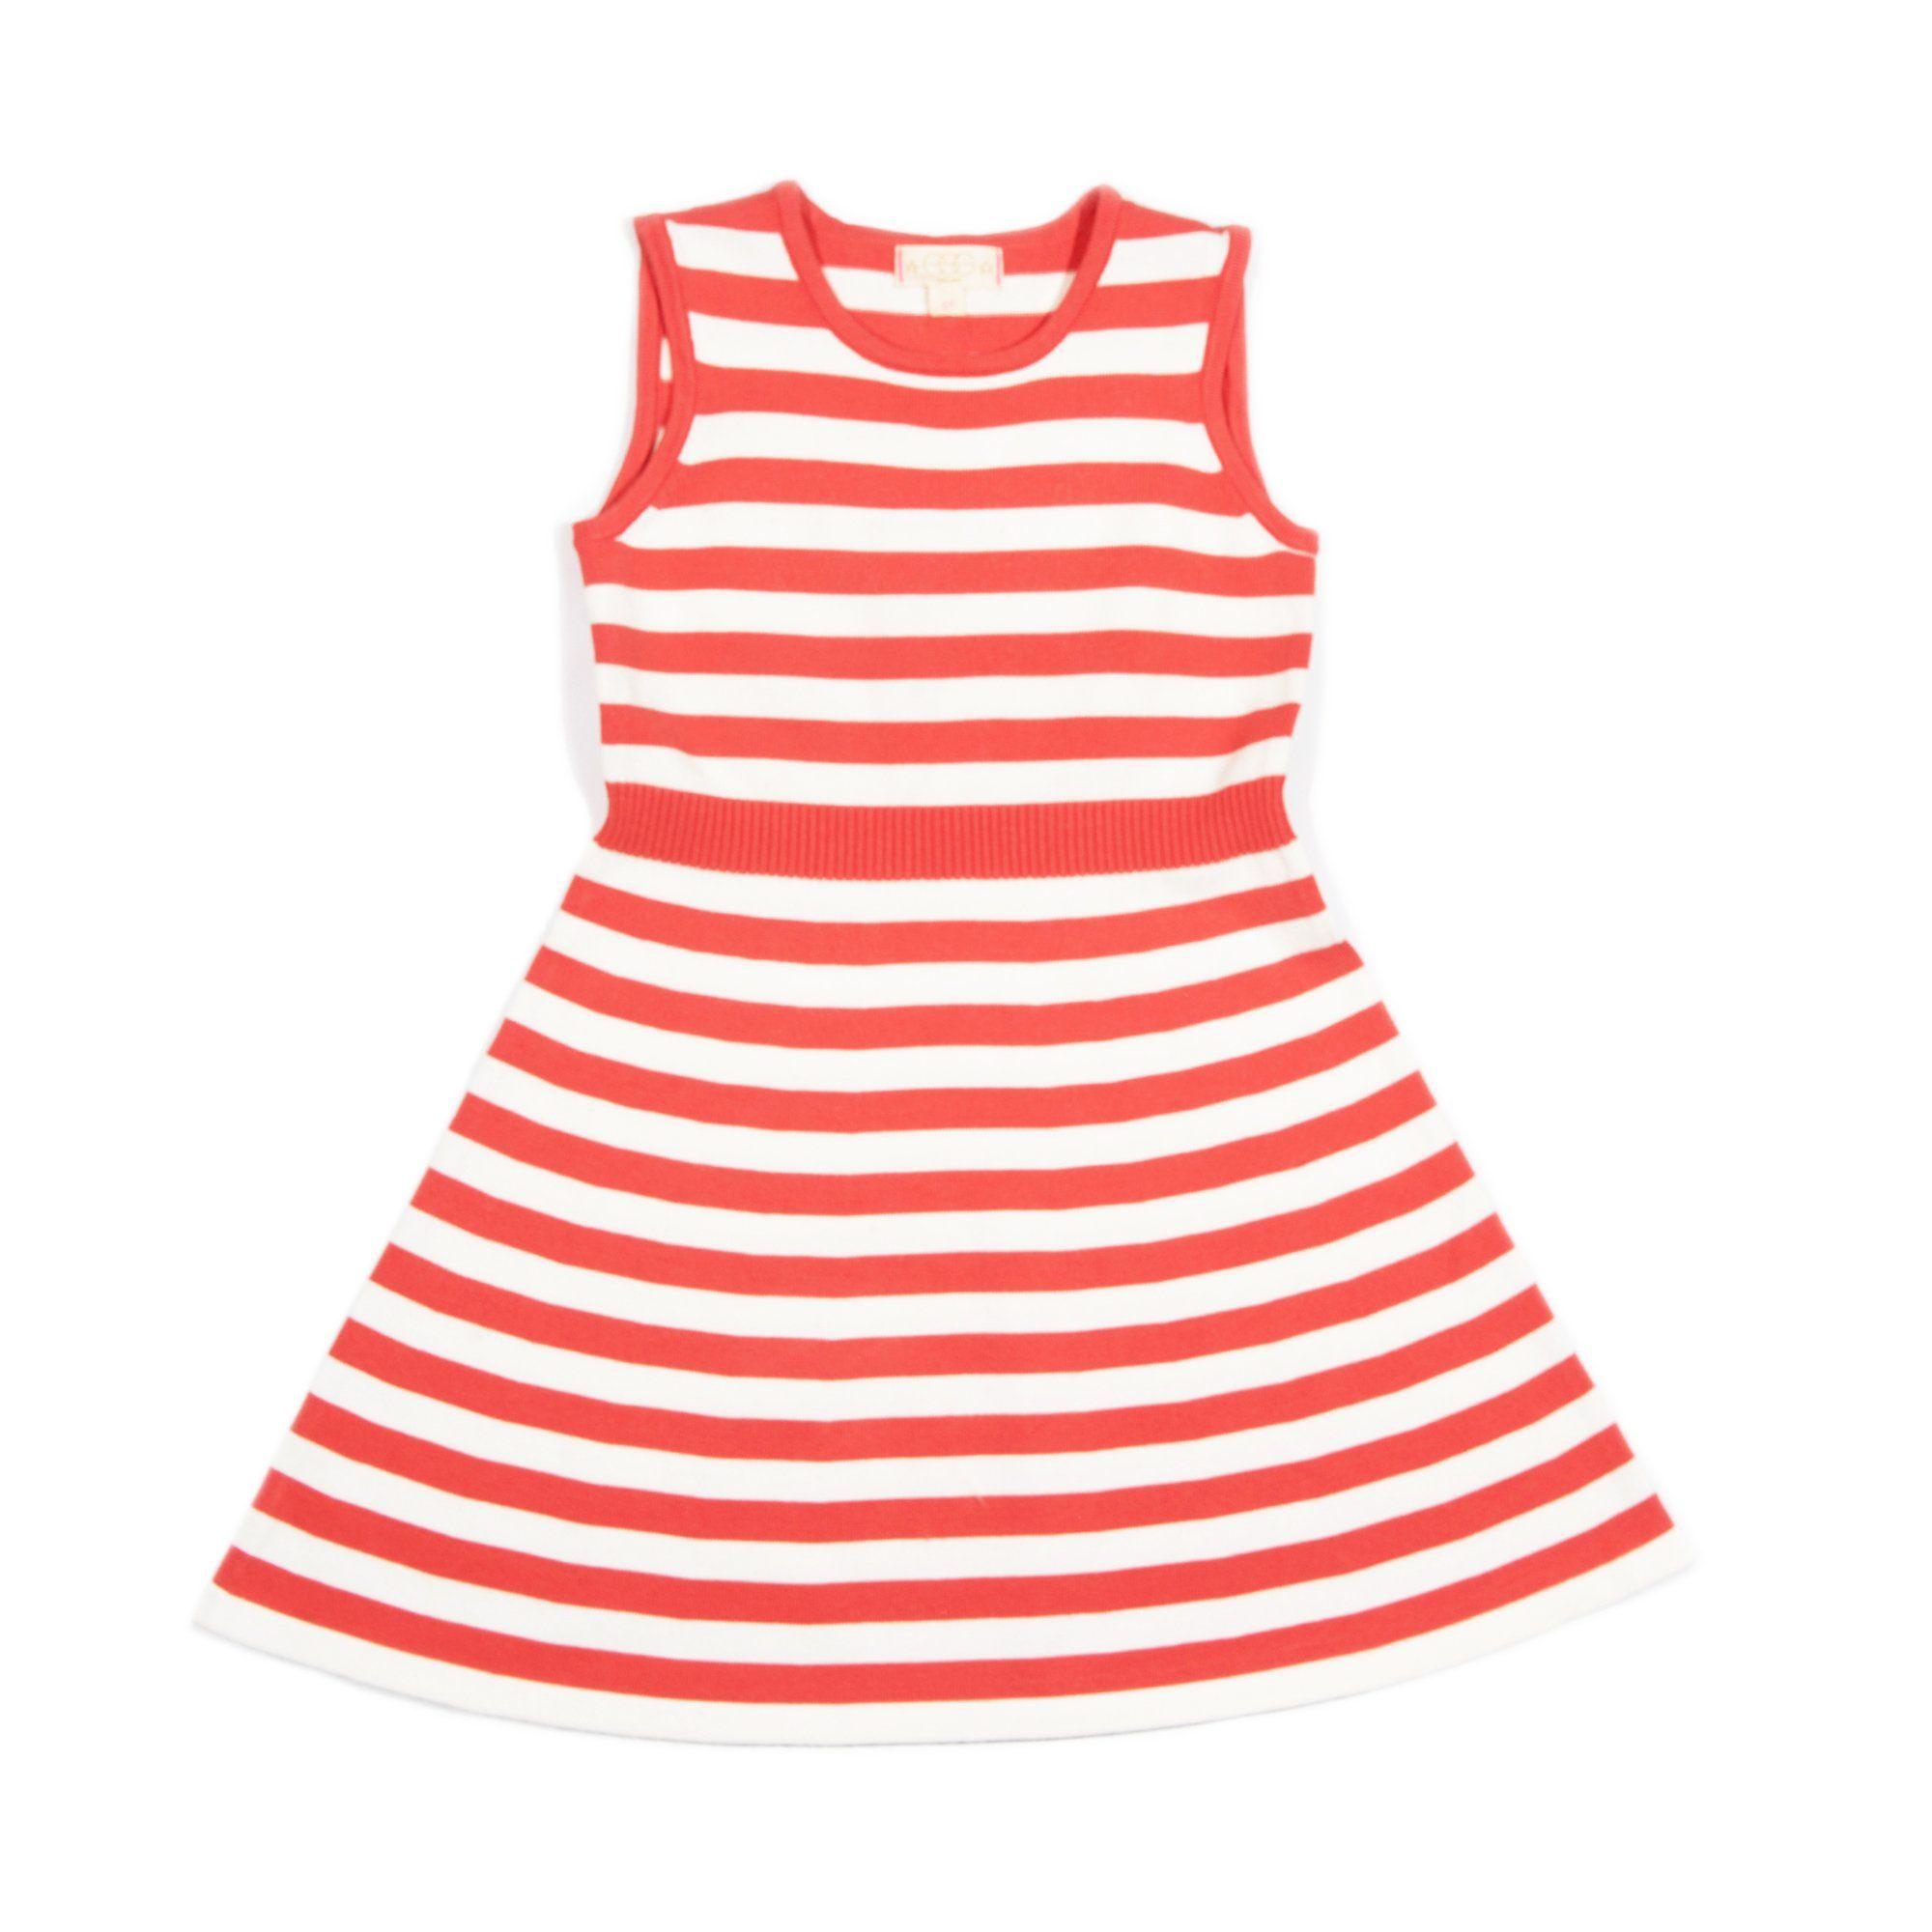 Macie Sweater Dress - Coral / 10Y